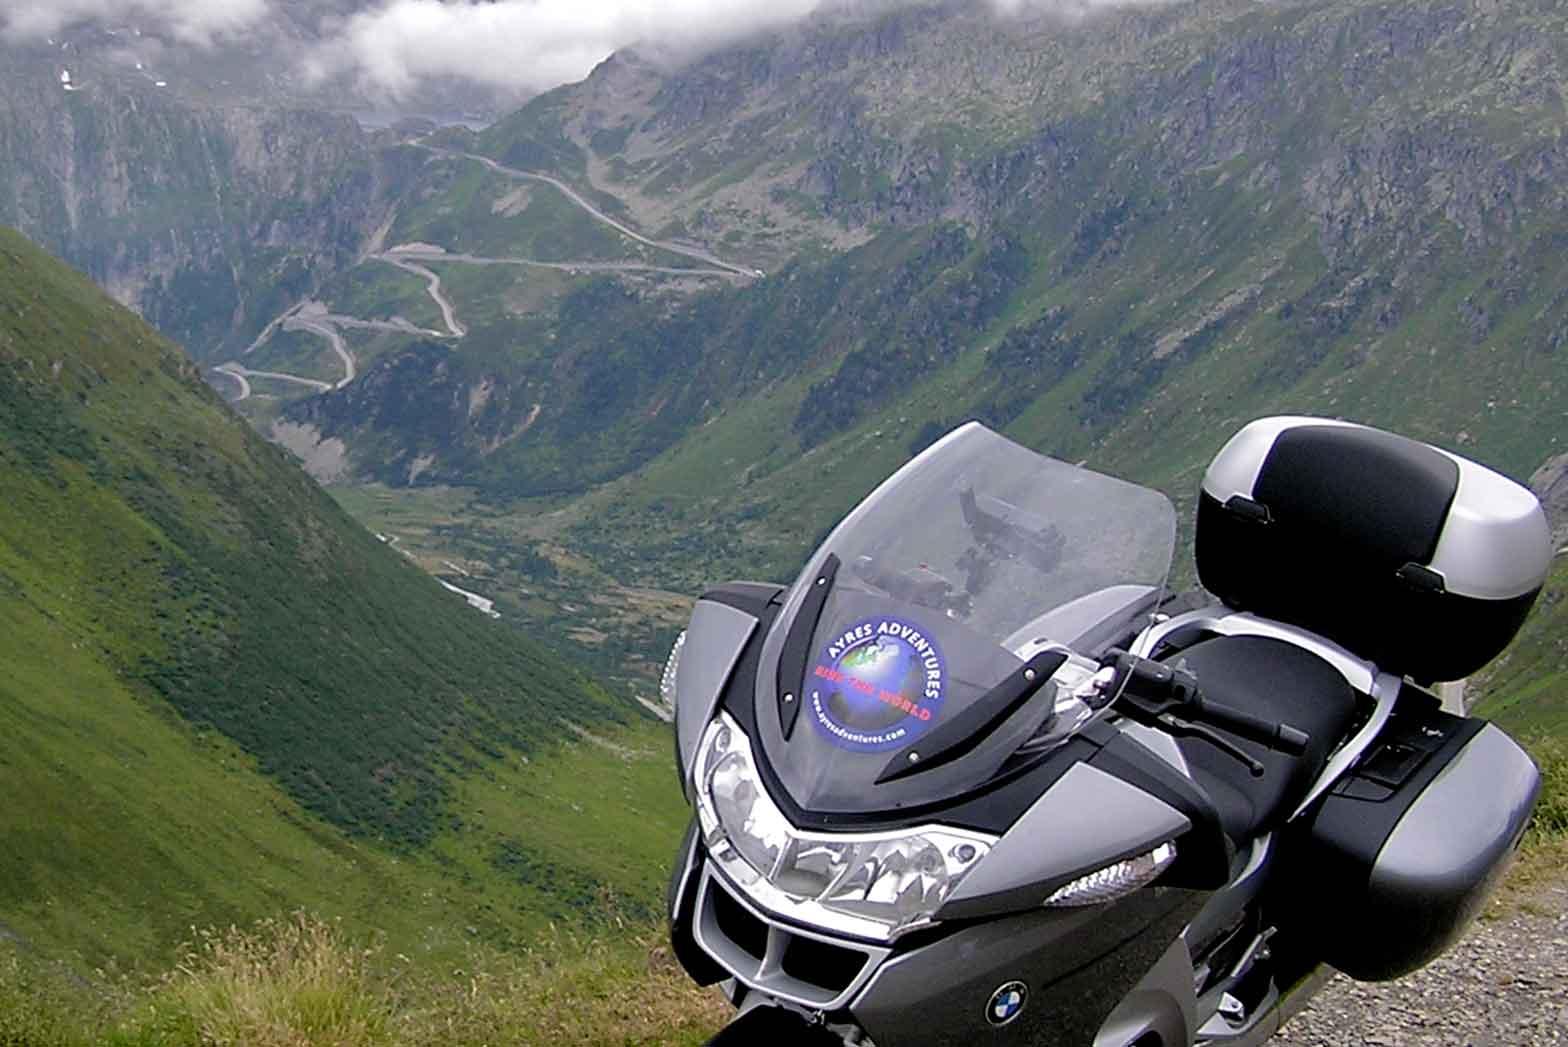 Scenic Alps View